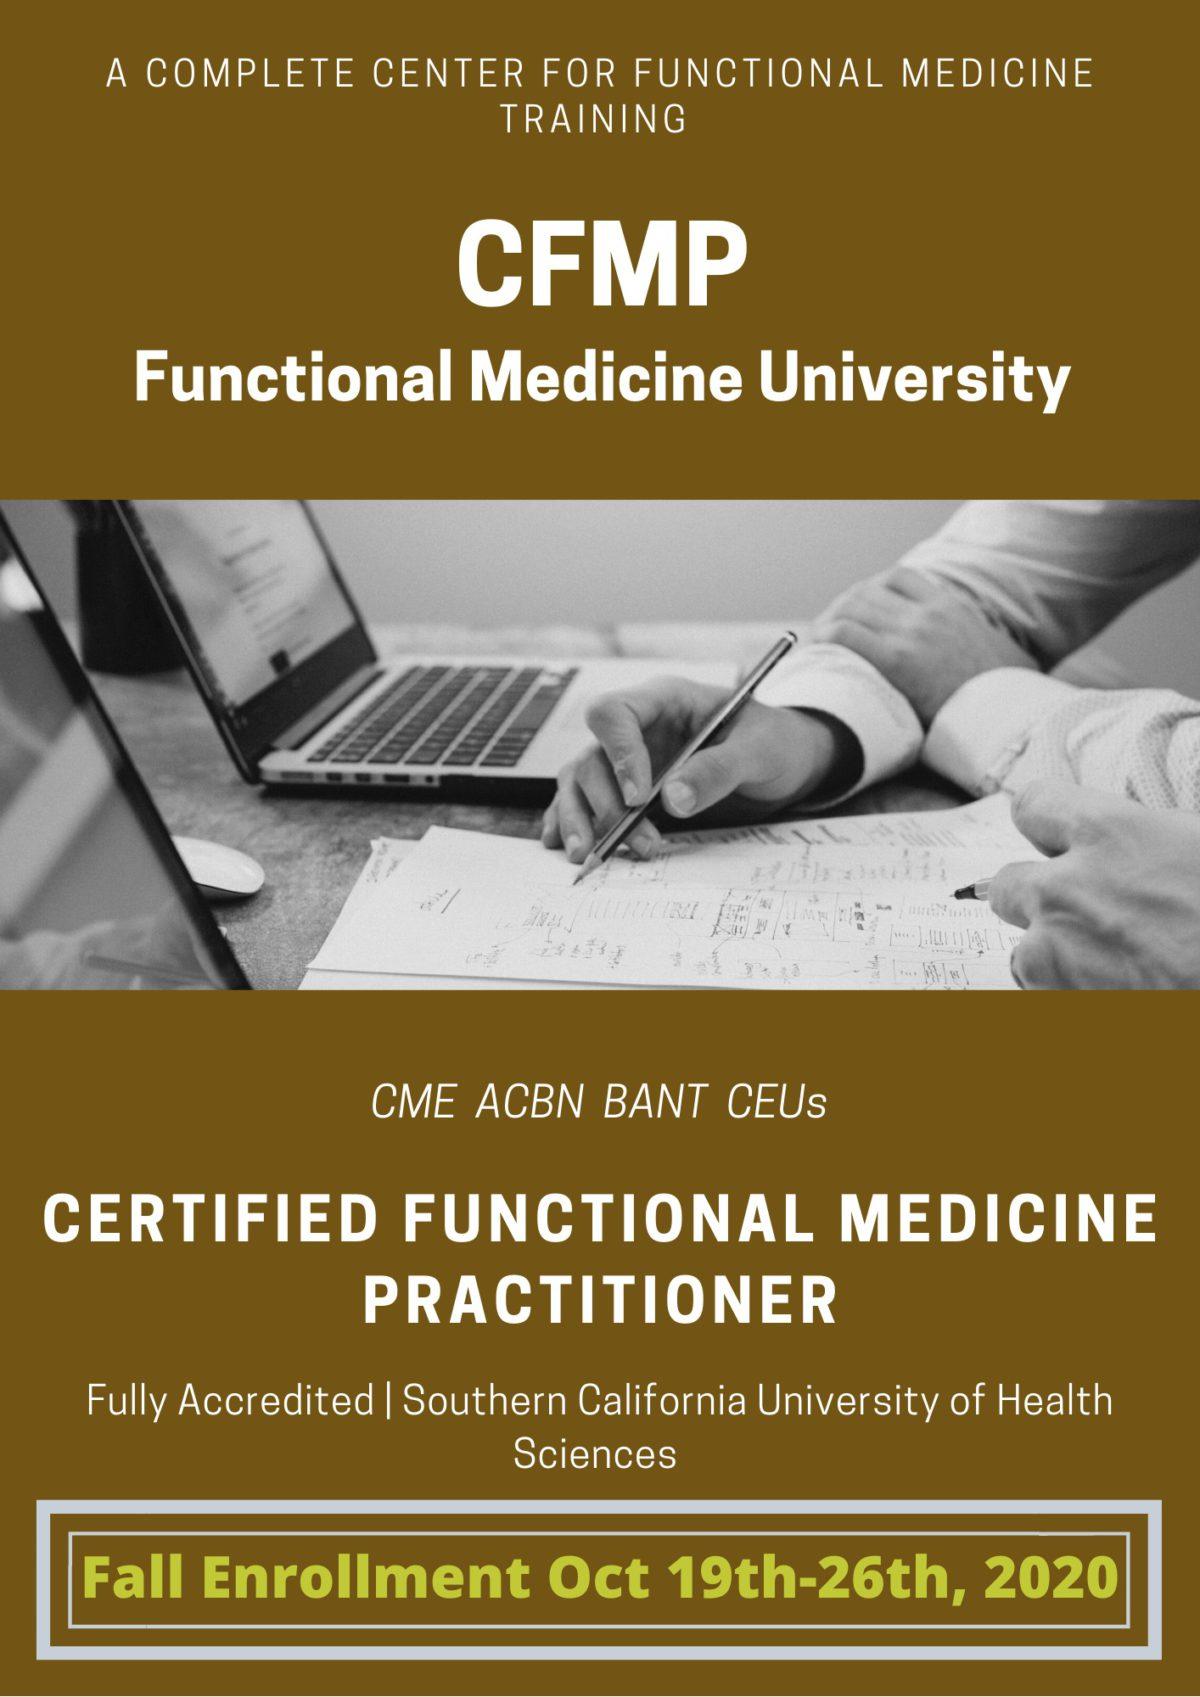 FMU Fall Enrollment for the CFMP Certified Functional Medicine Practitioner